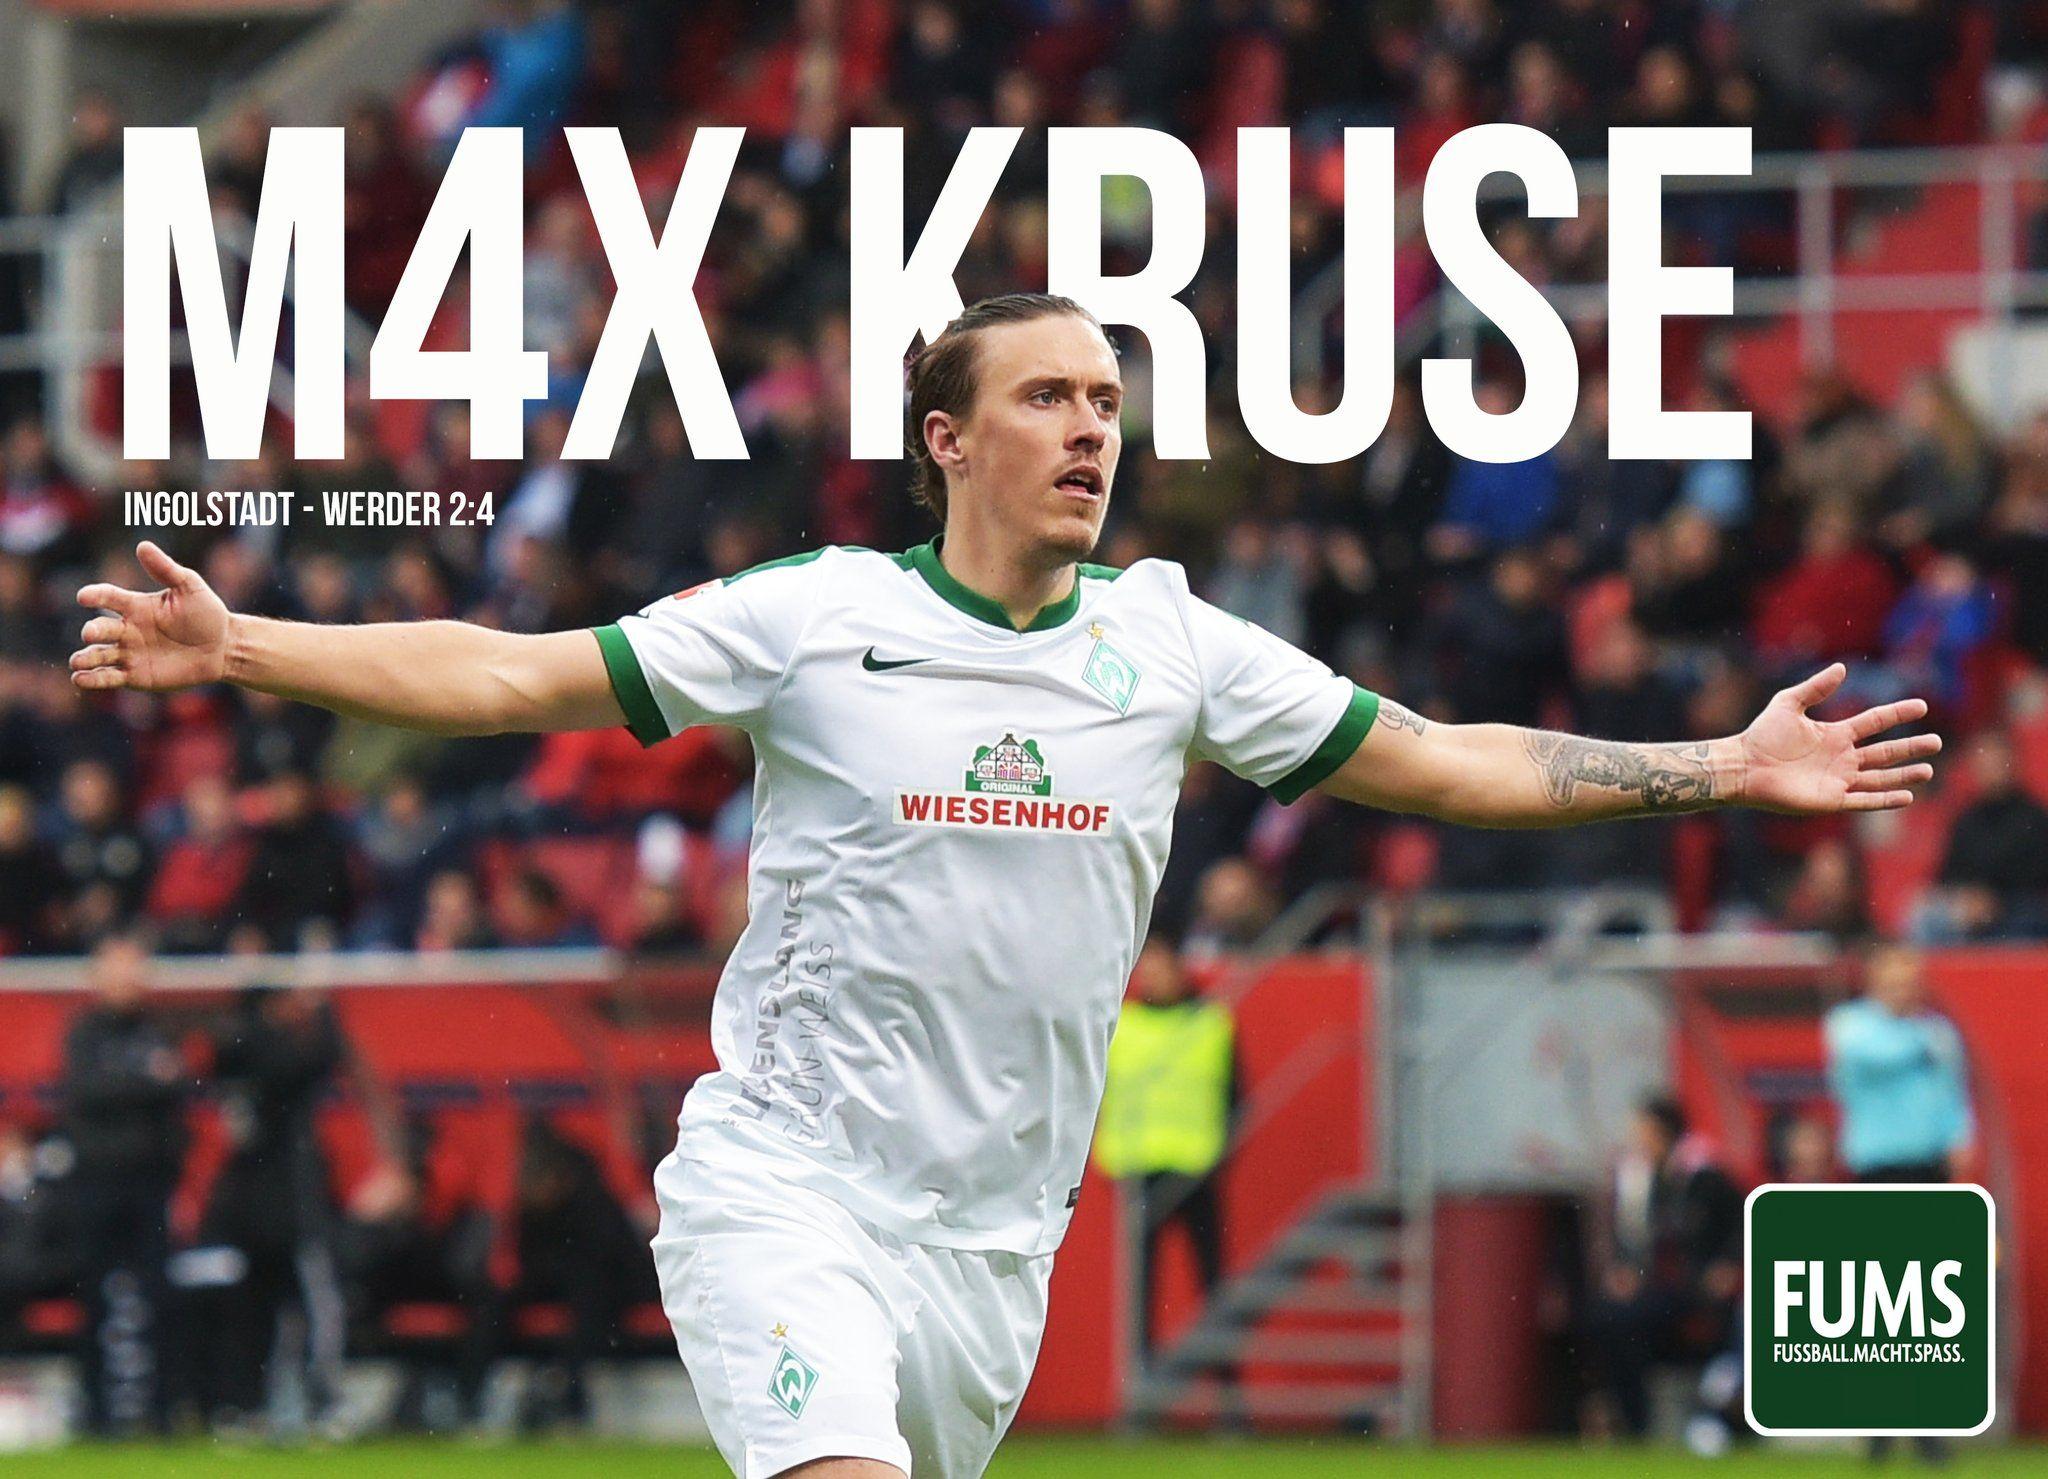 Max Kruse Fußballgott!